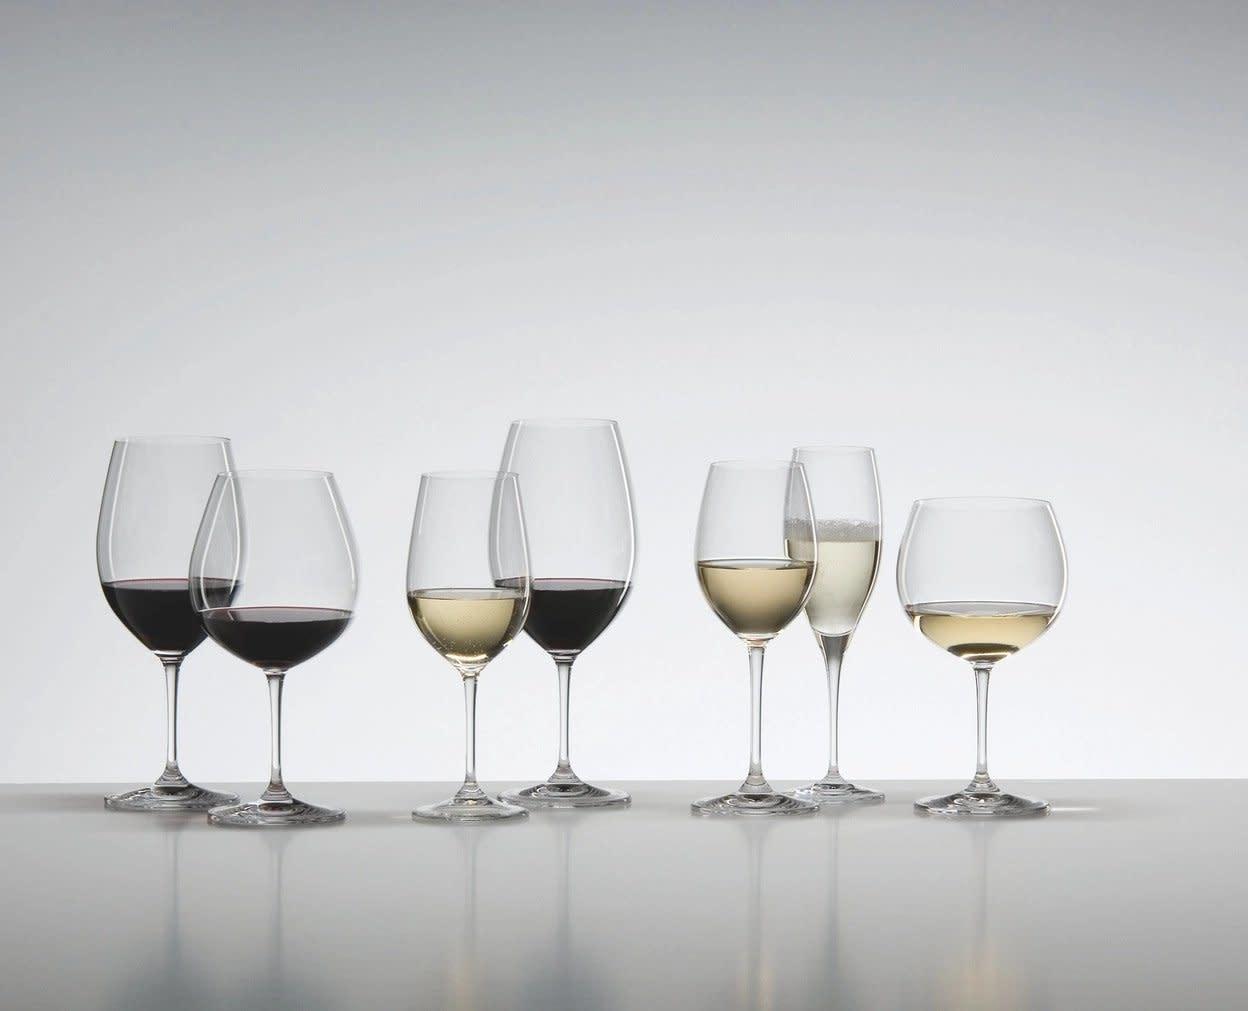 Sauvignon Blanc Glasses Set 2 Pcs-6